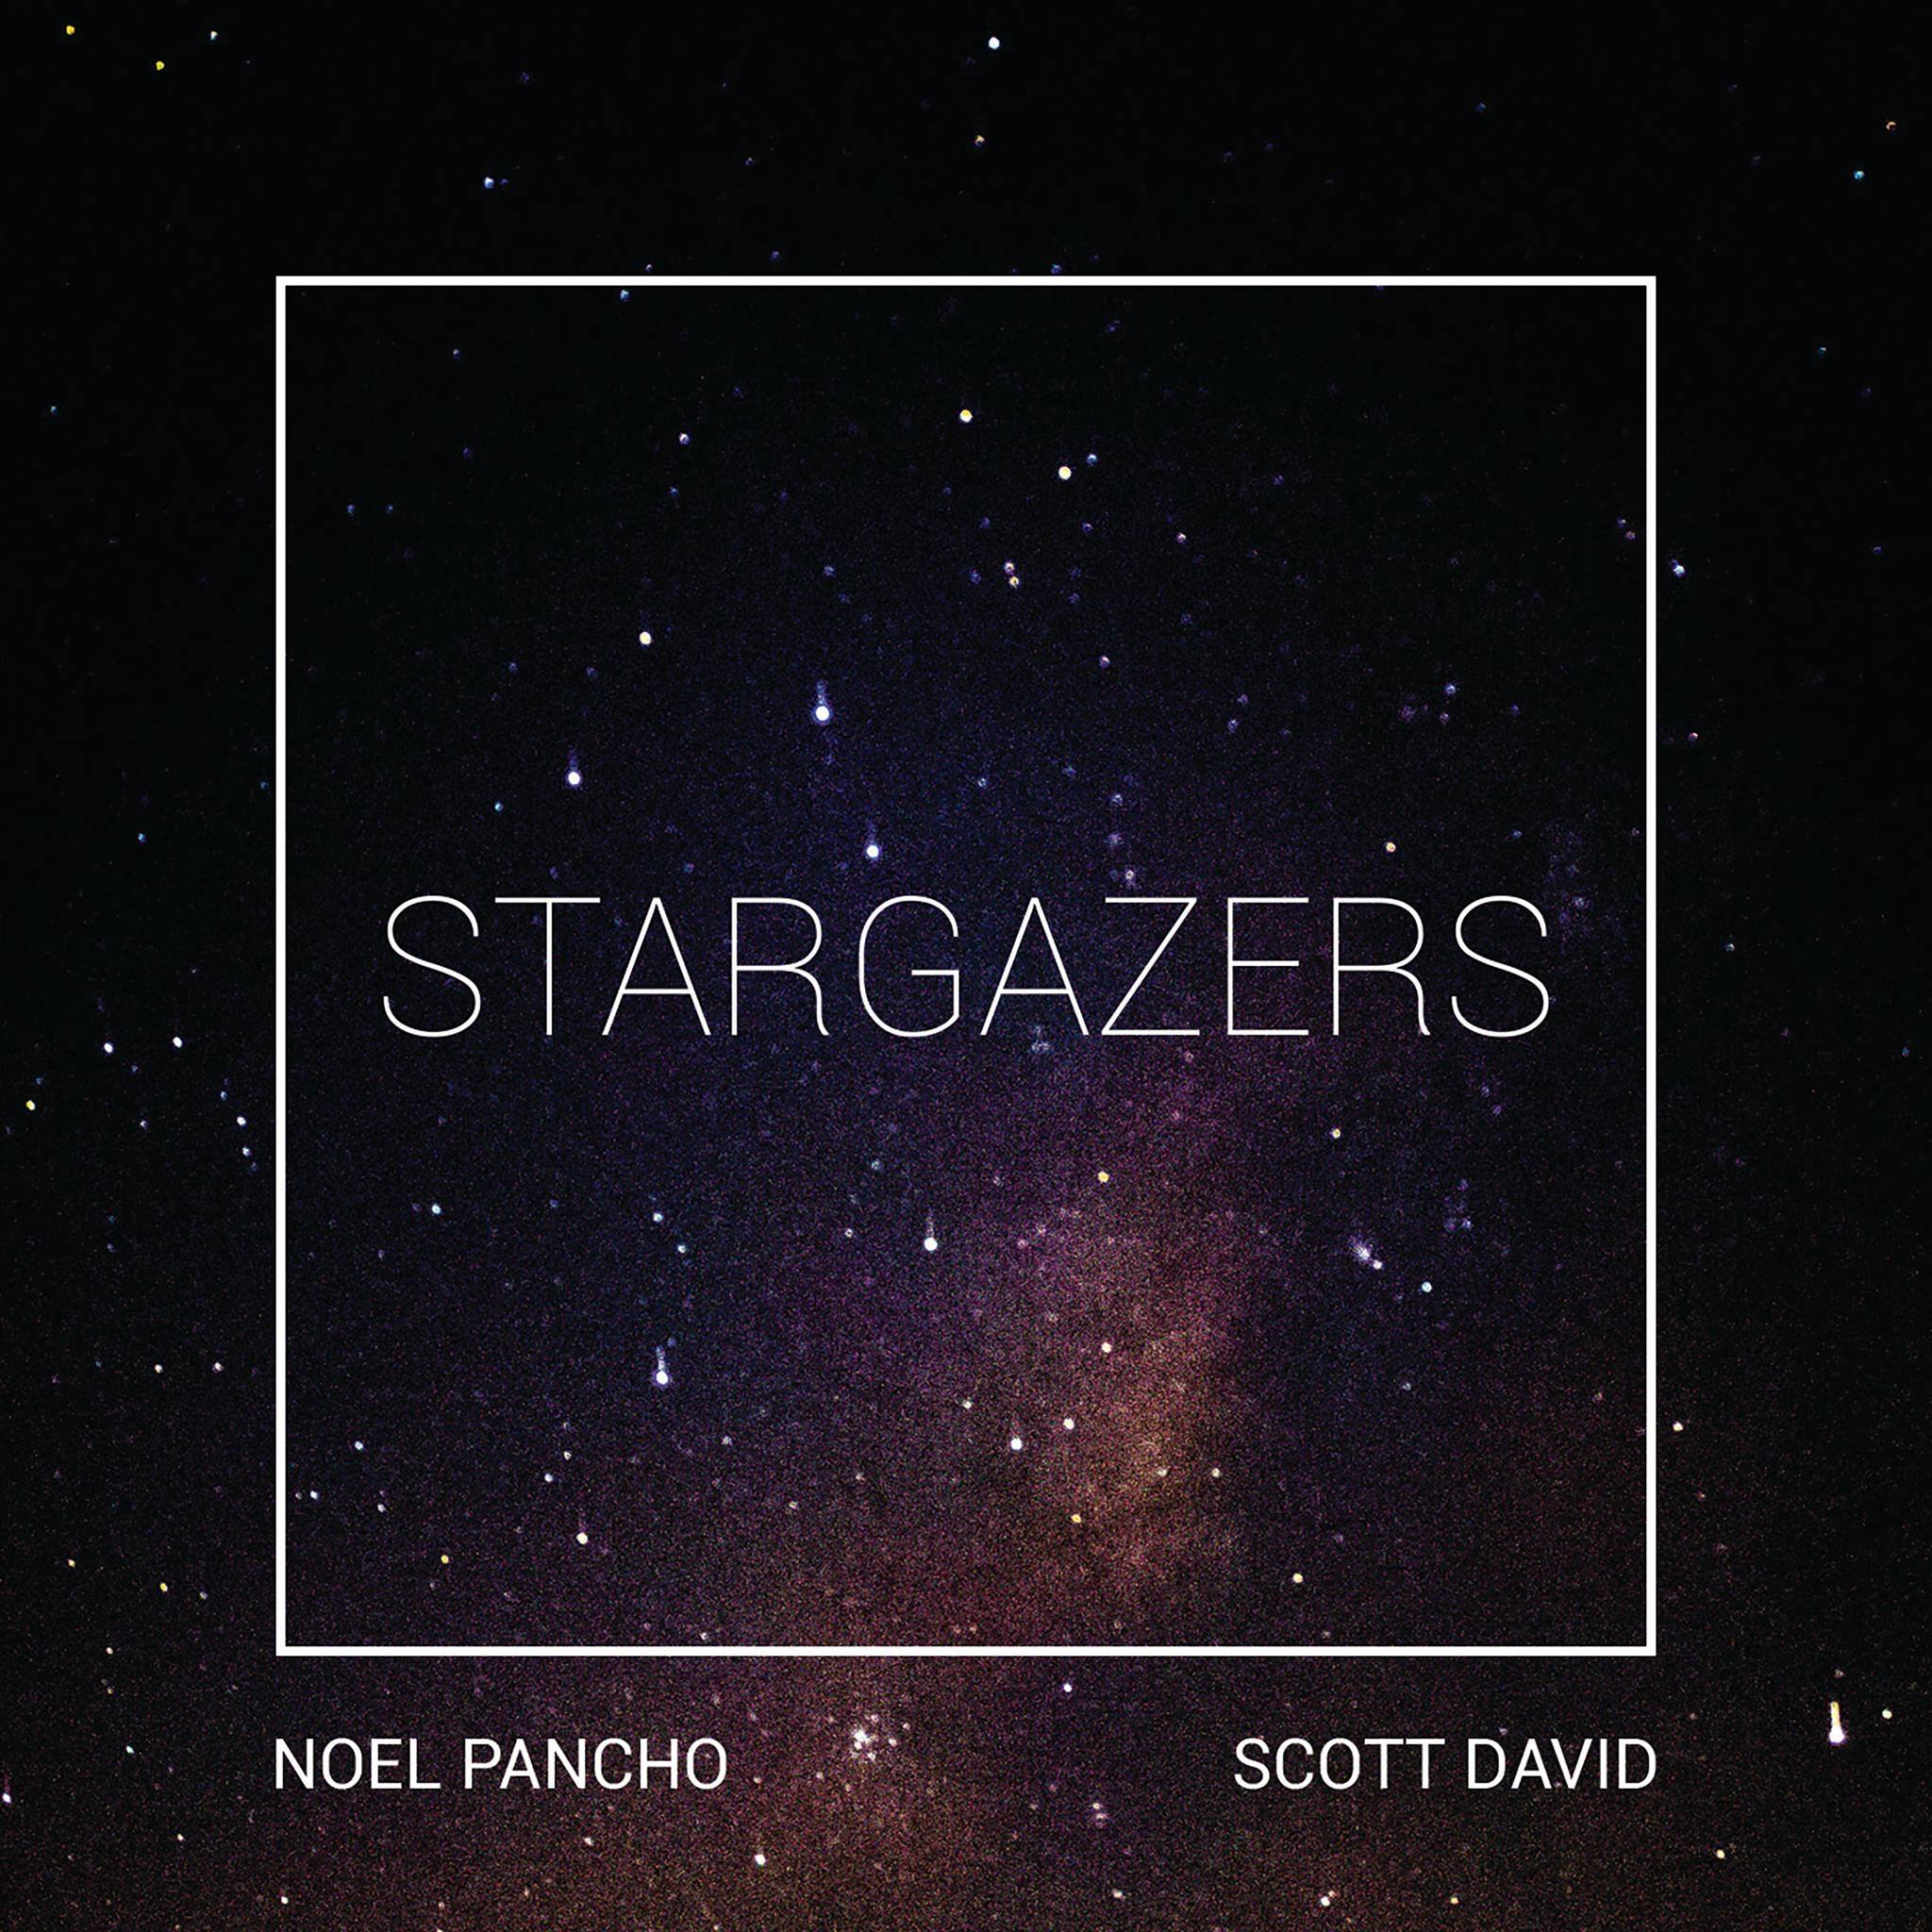 Noel Pancho - 'Stargazers' EP